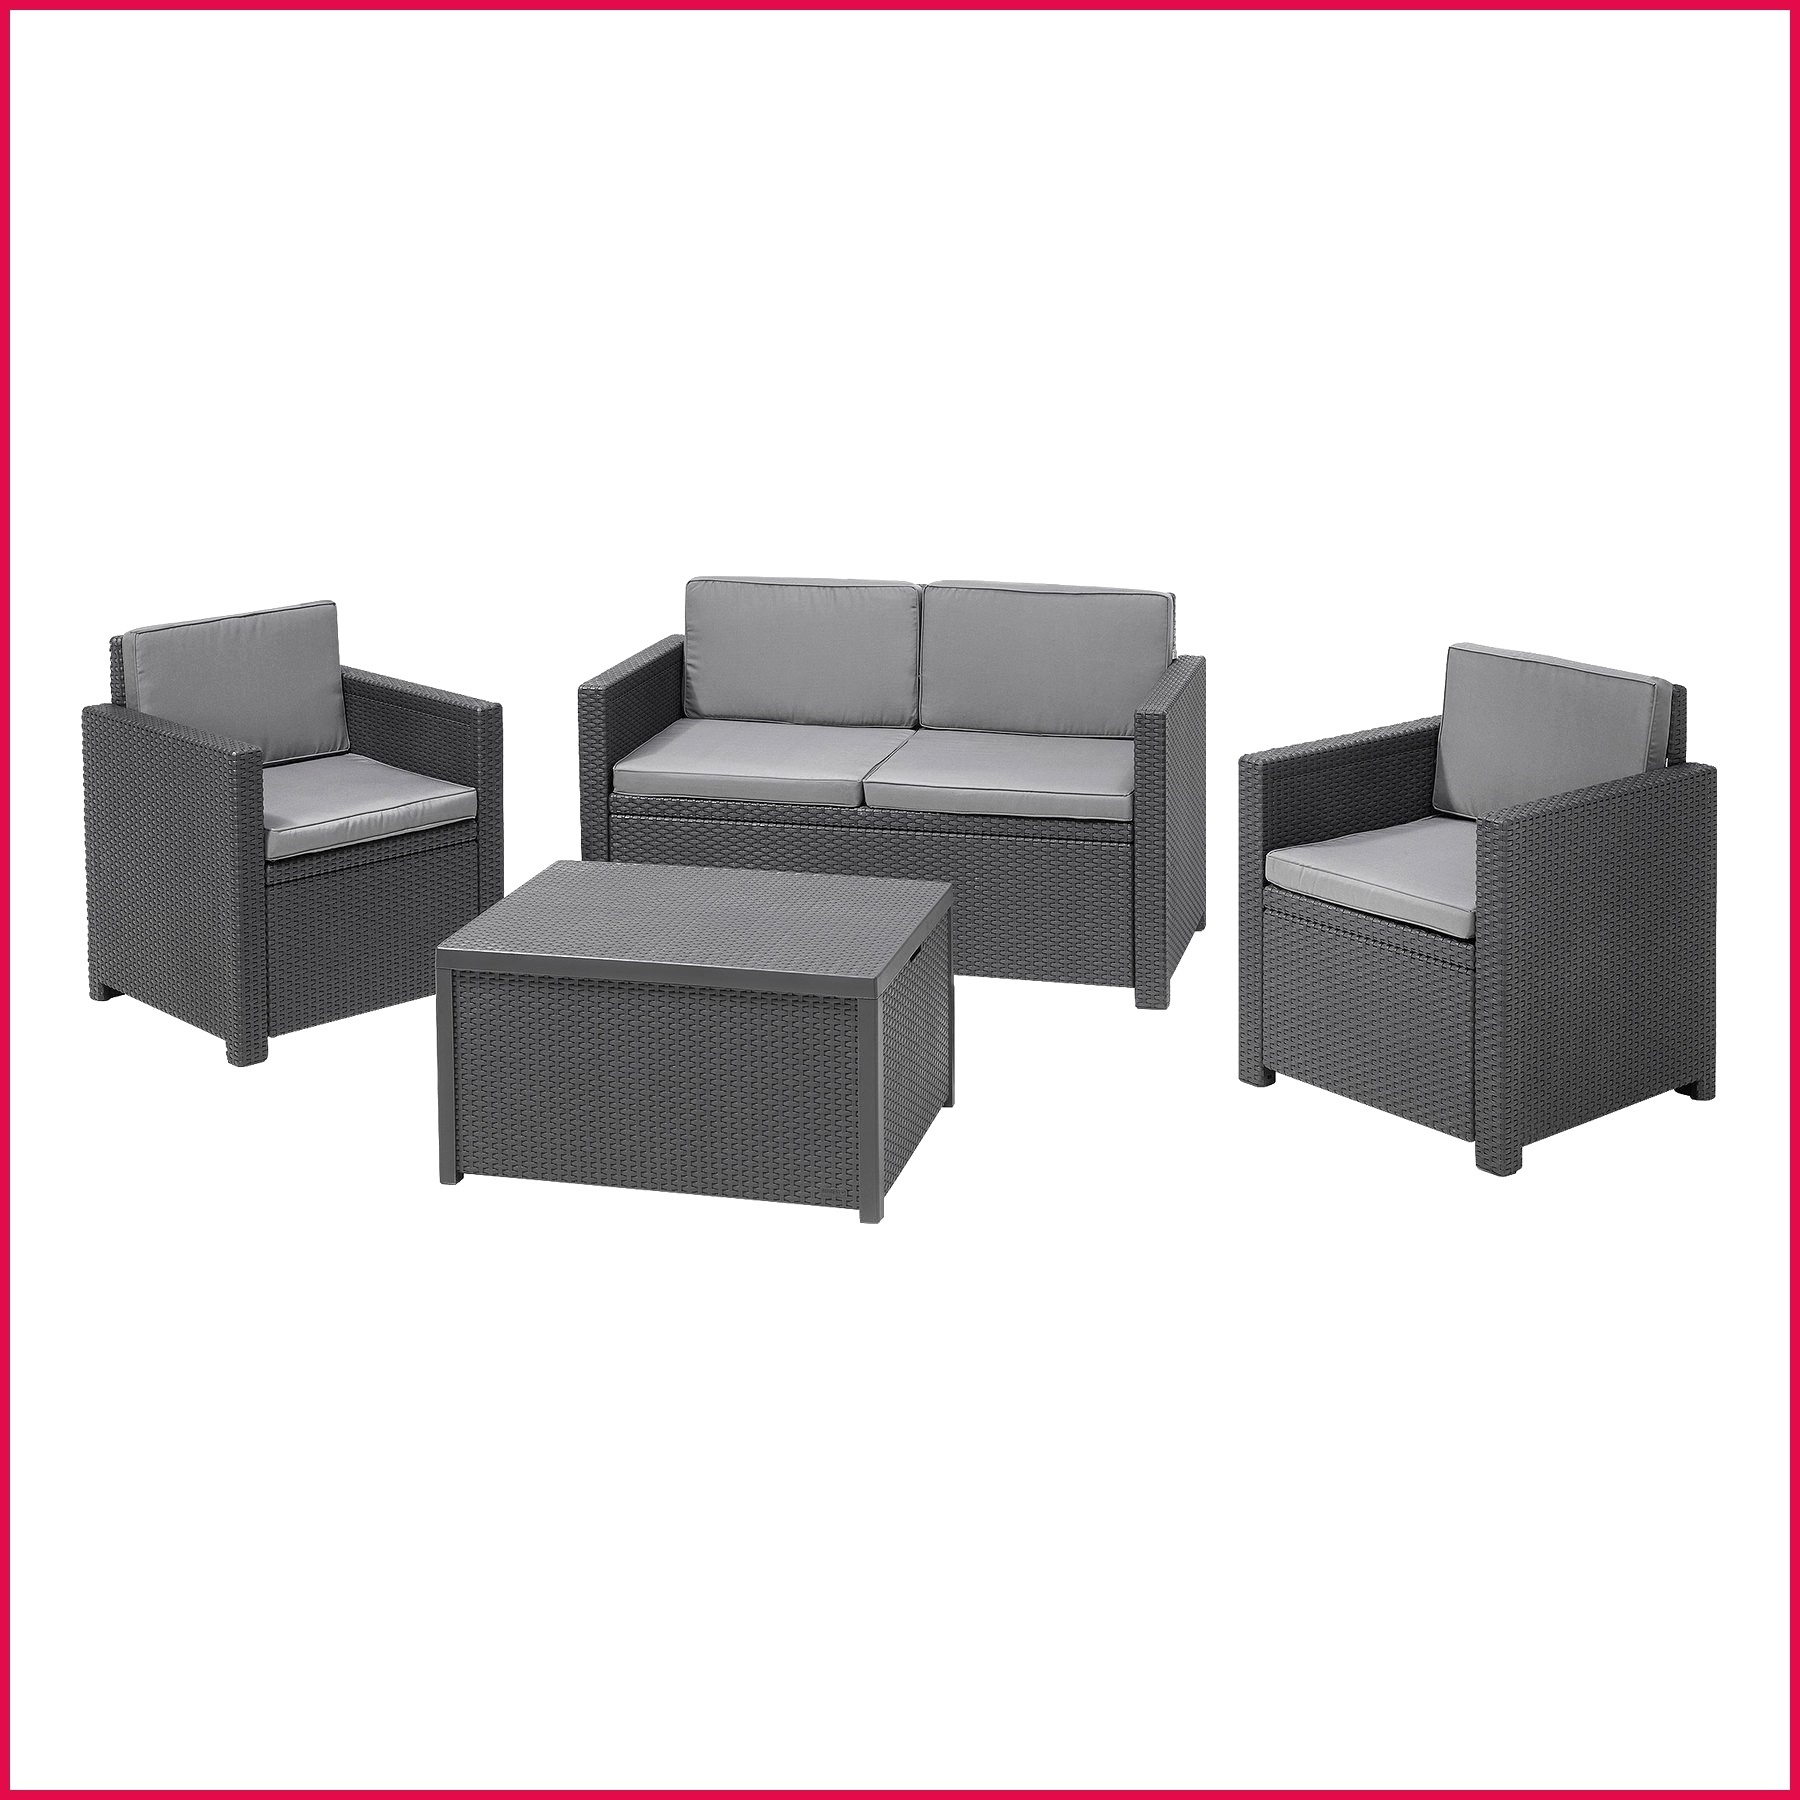 pot de chambre i luxe photos meilleur de de chaise pliante i schc2a8me idees de table of pot de chambre i